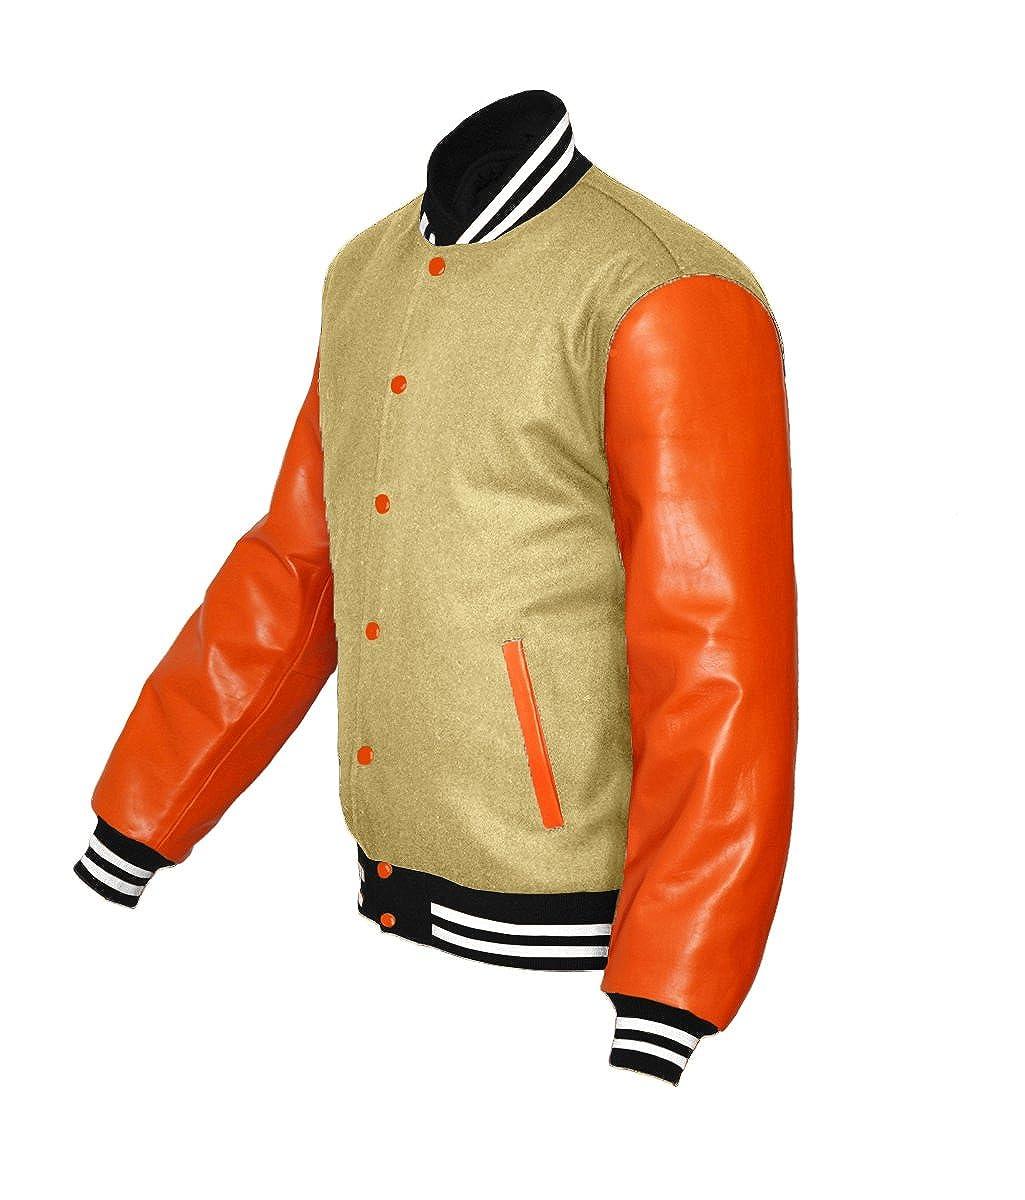 luvsecretlingerie Original American Varsity Real Orange Leather Letterman College Baseball Kid Wool Jackets #O-W-O